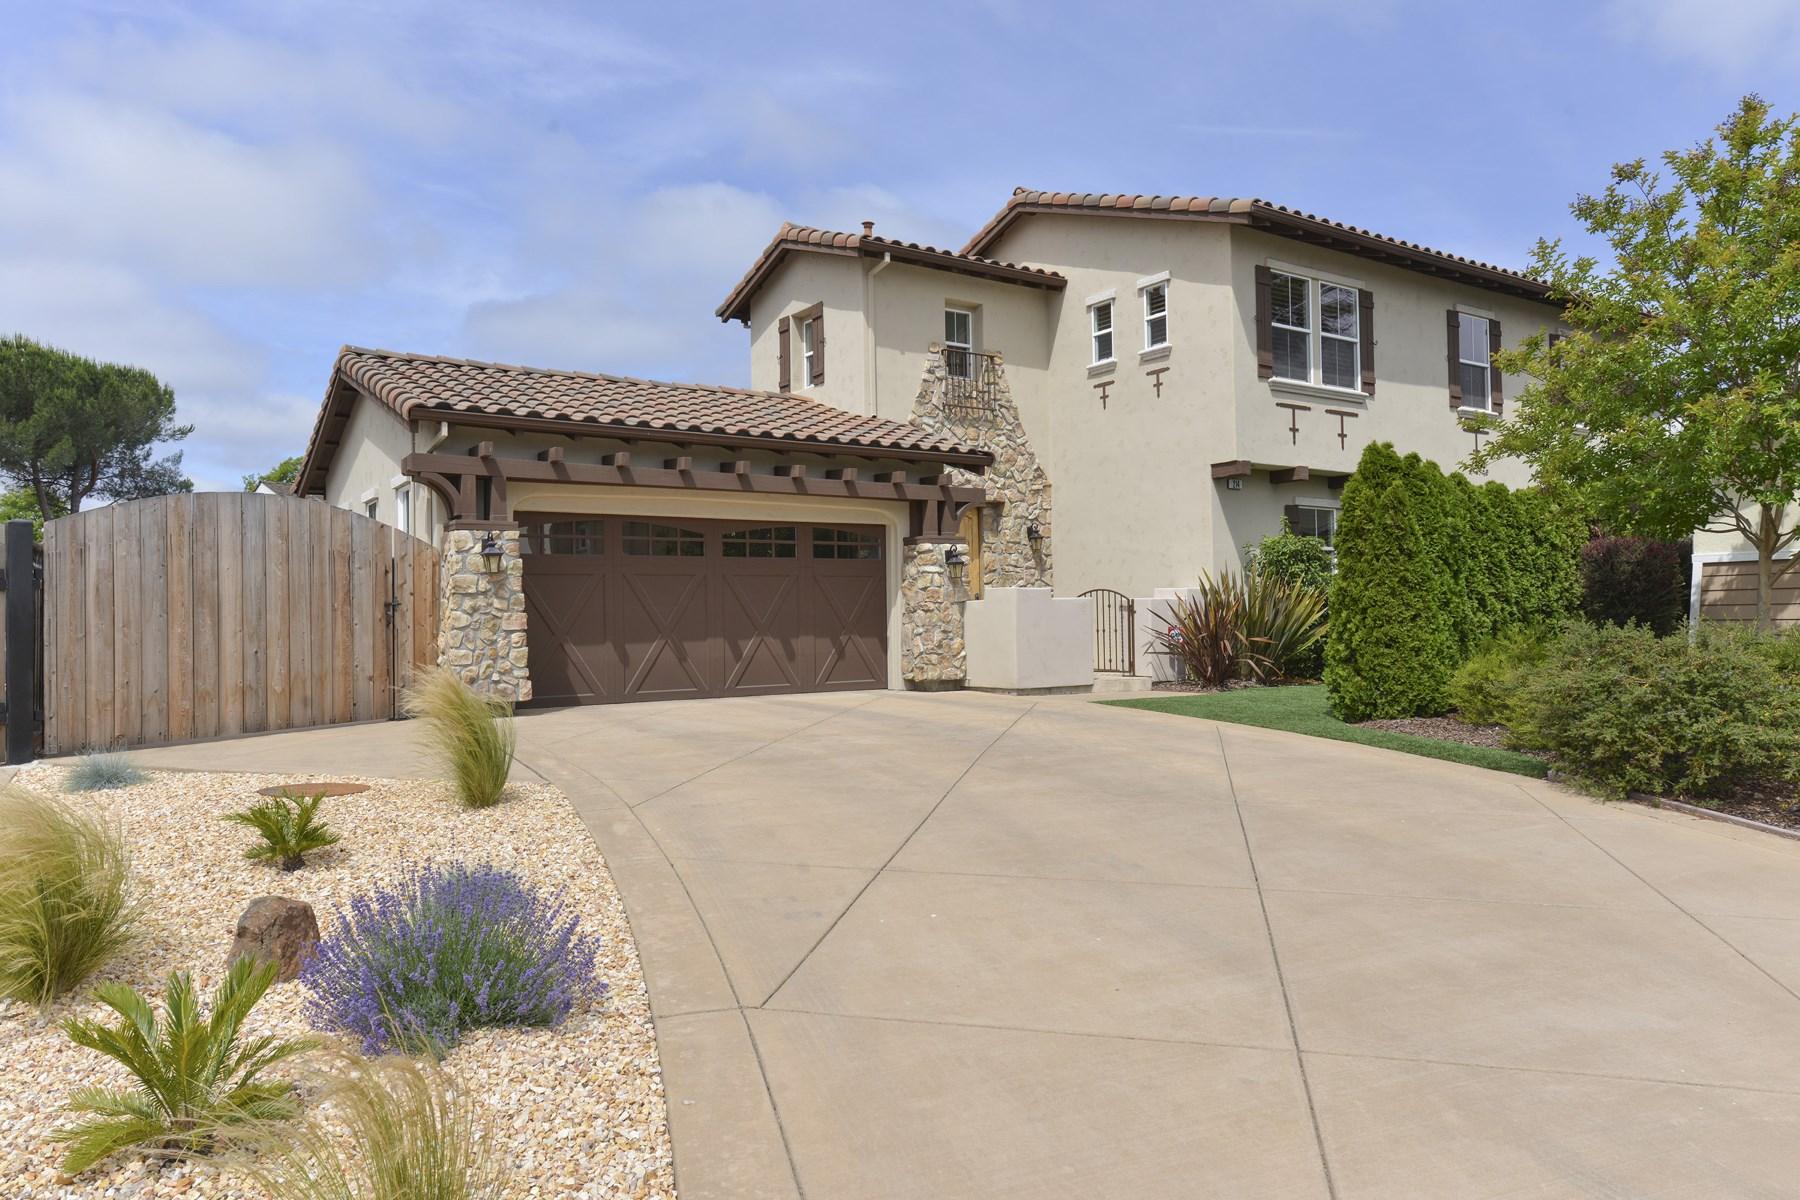 Casa para uma família para Venda às Stylish Mediterranean 214 Cole Ranch Ct Napa, Califórnia 94558 Estados Unidos